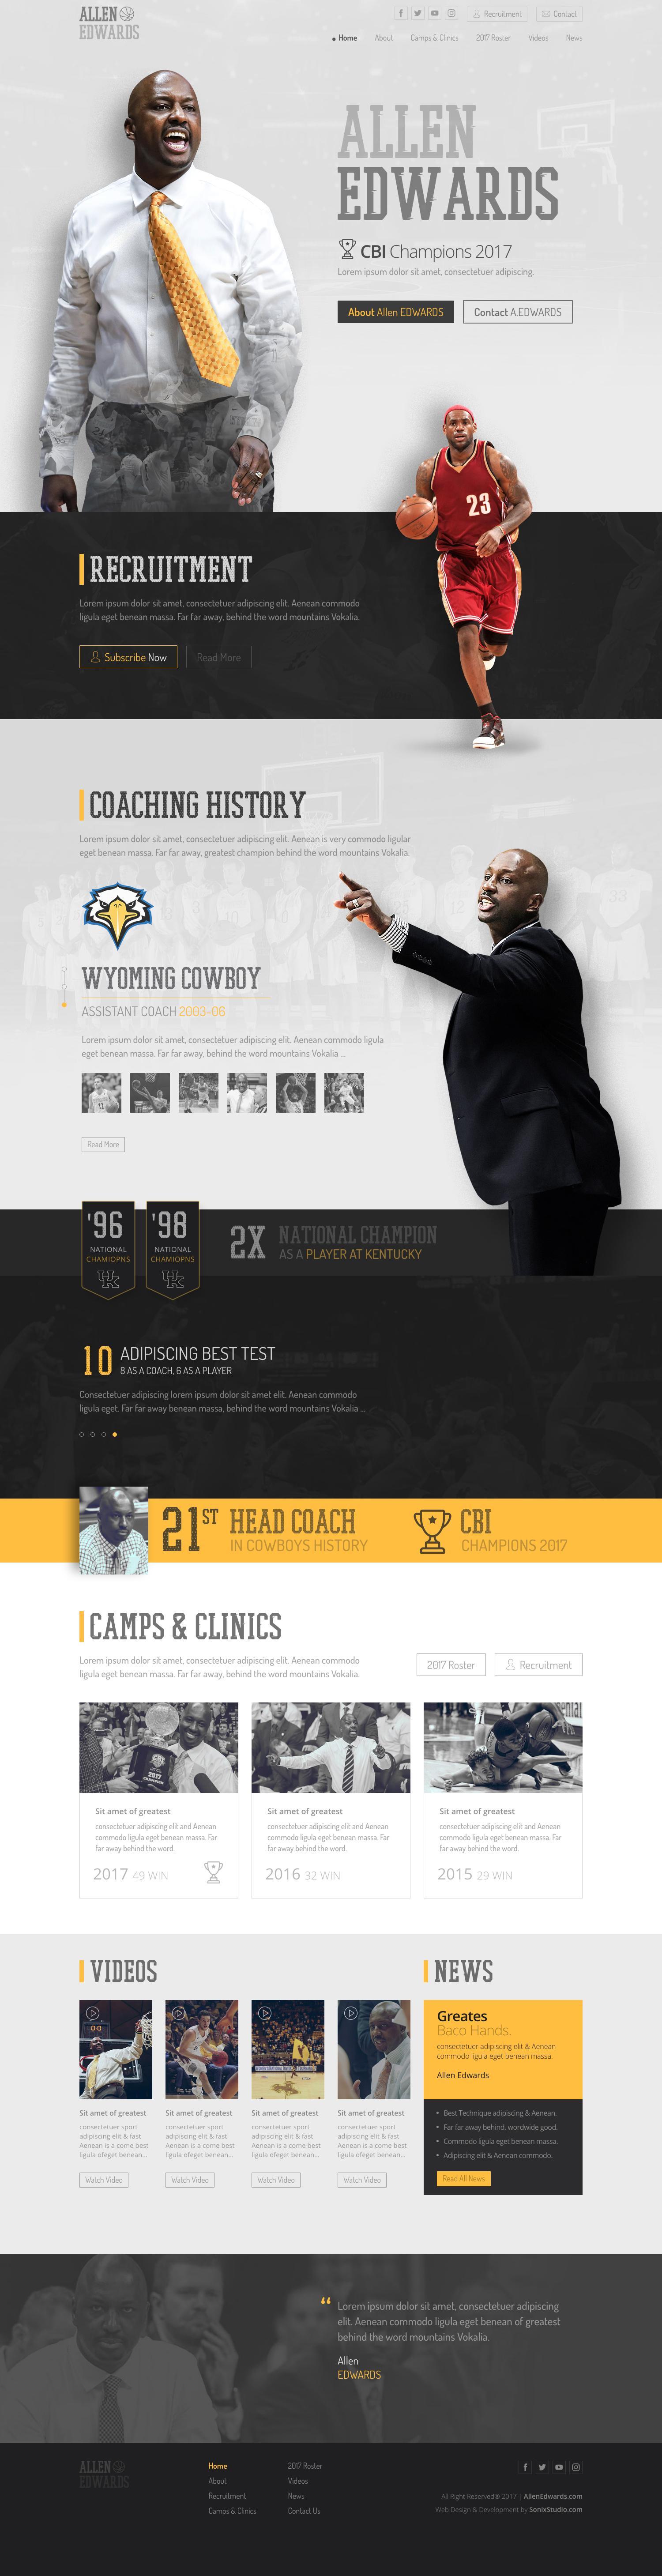 Black White Yellow Web Design Plus The Html For Allen Edwards Basketball Coach Cbi Sports Design Inspiration Sports Design Sports Illustrations Design